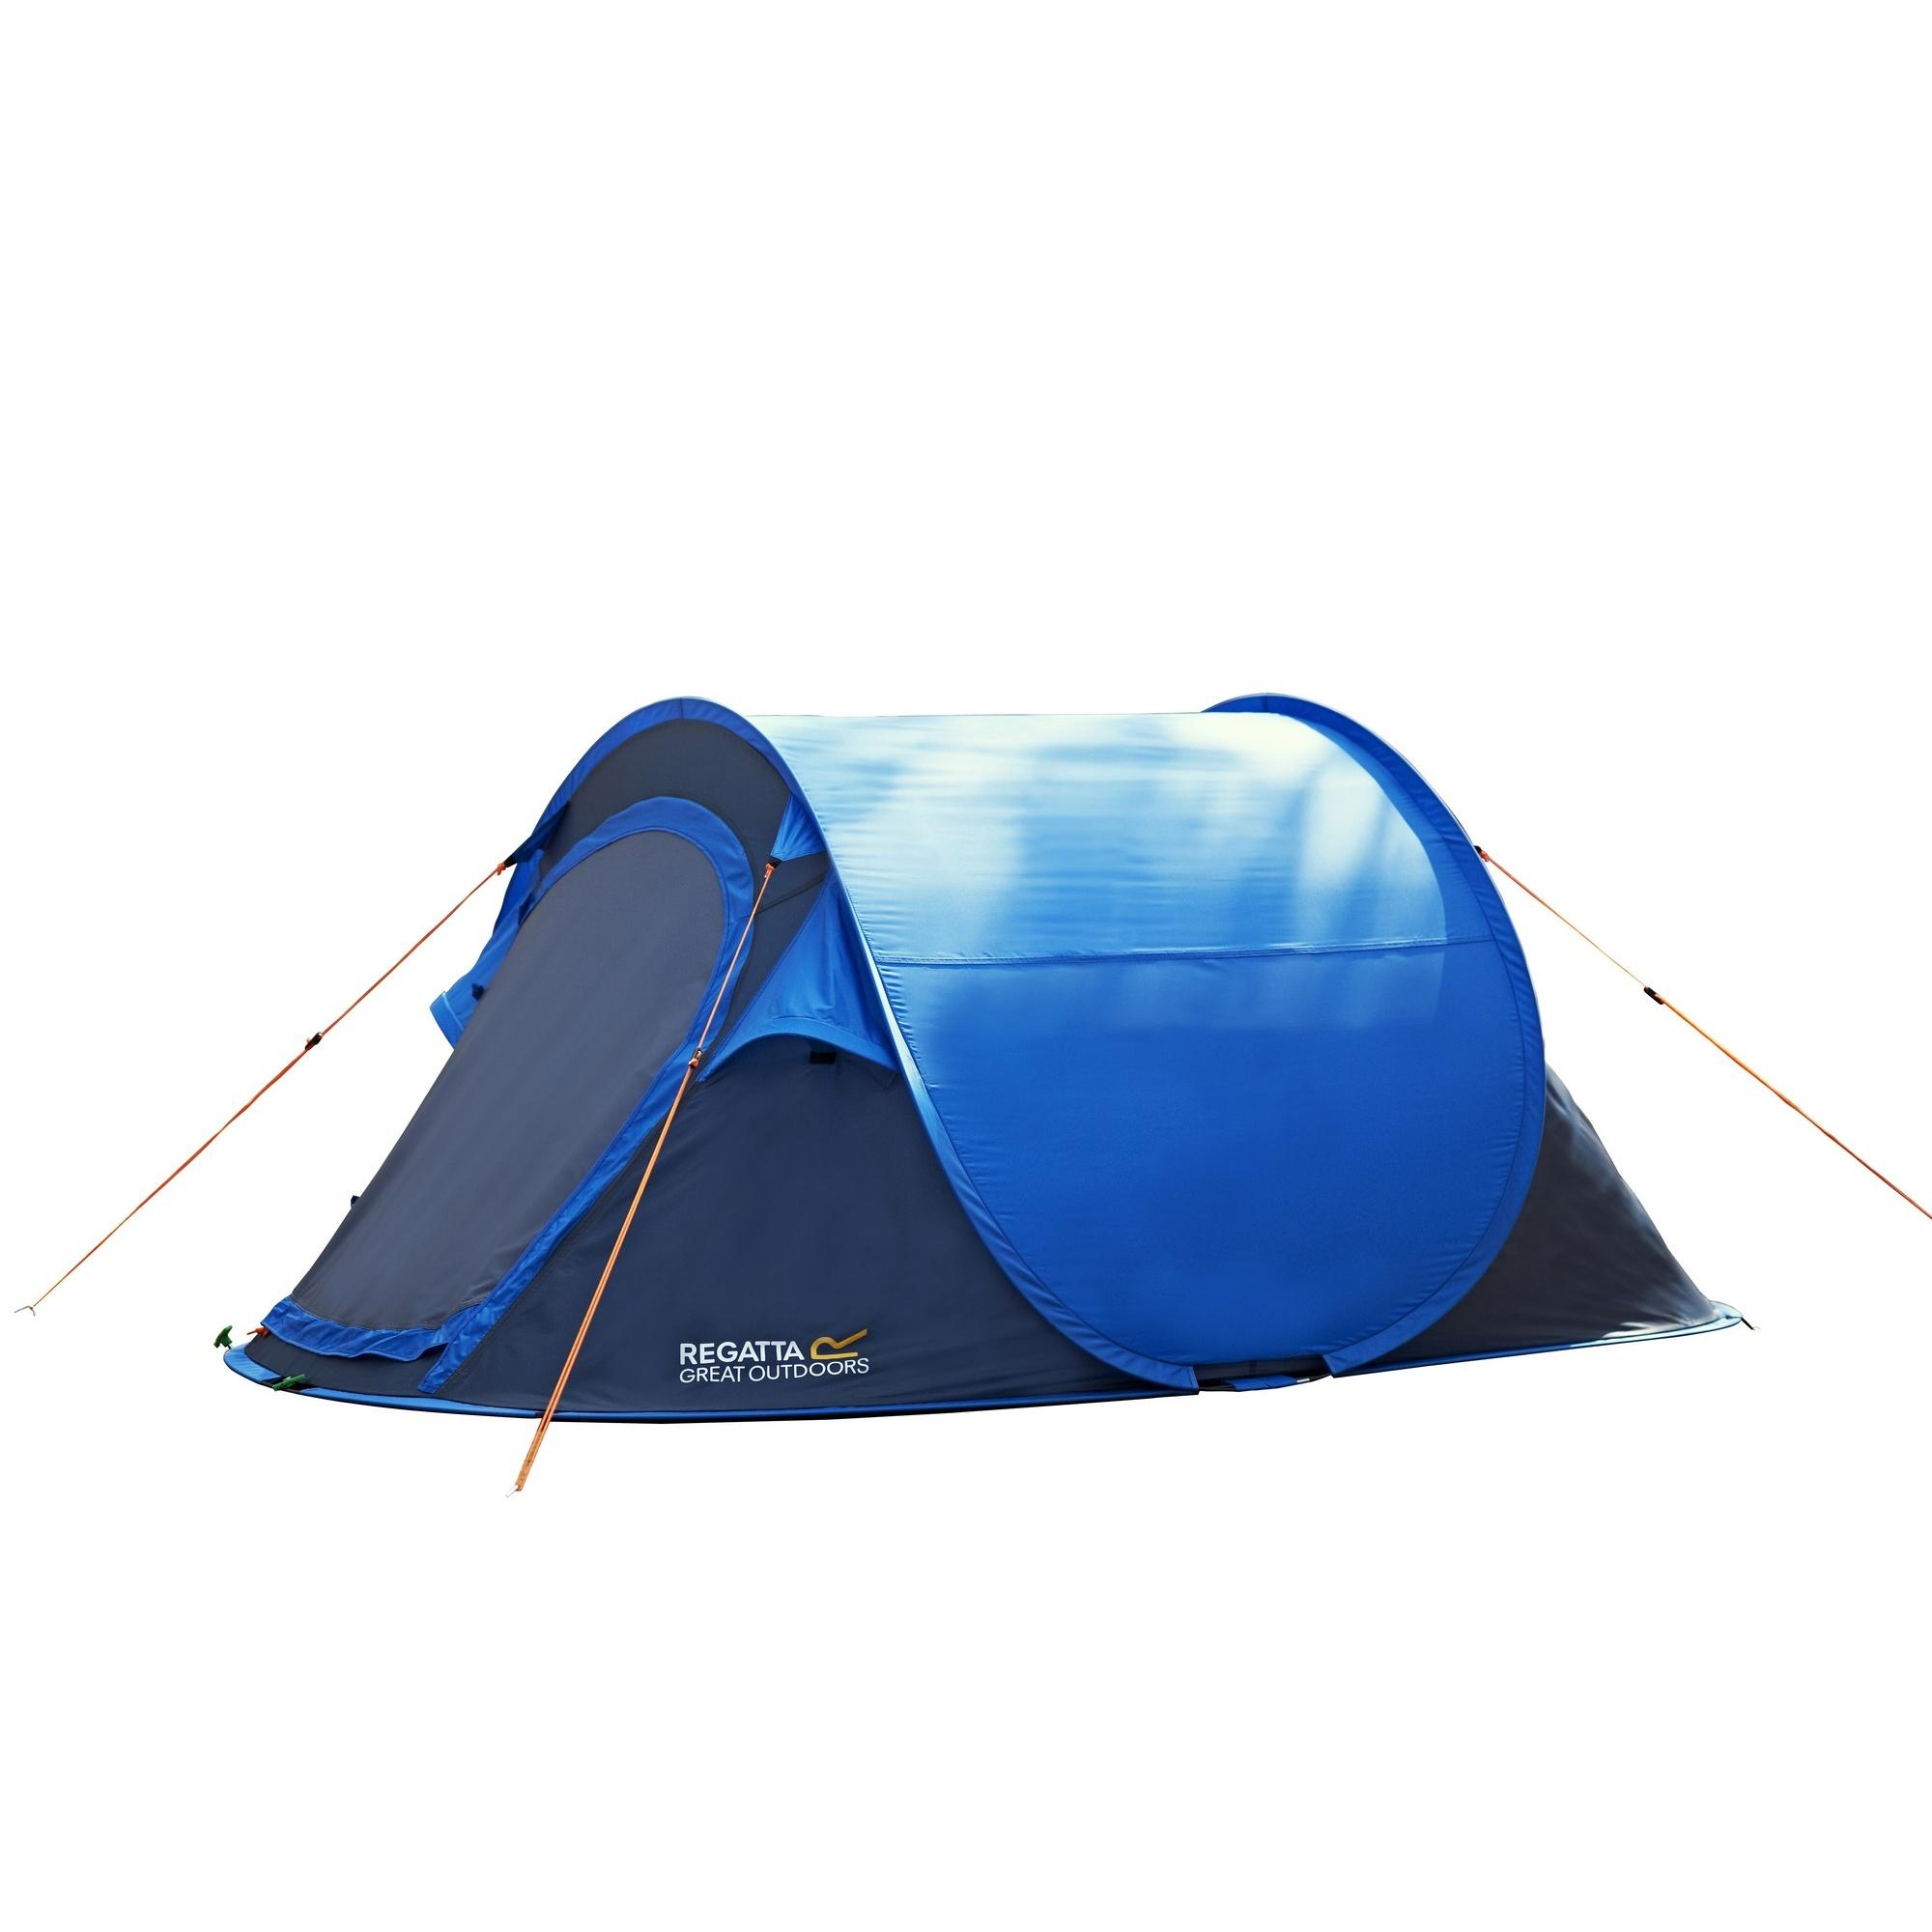 Regatta-Great-Outdoors-Malawi-2-Tenda-da-Campeggio-Pop-Up-per-Due-Persone